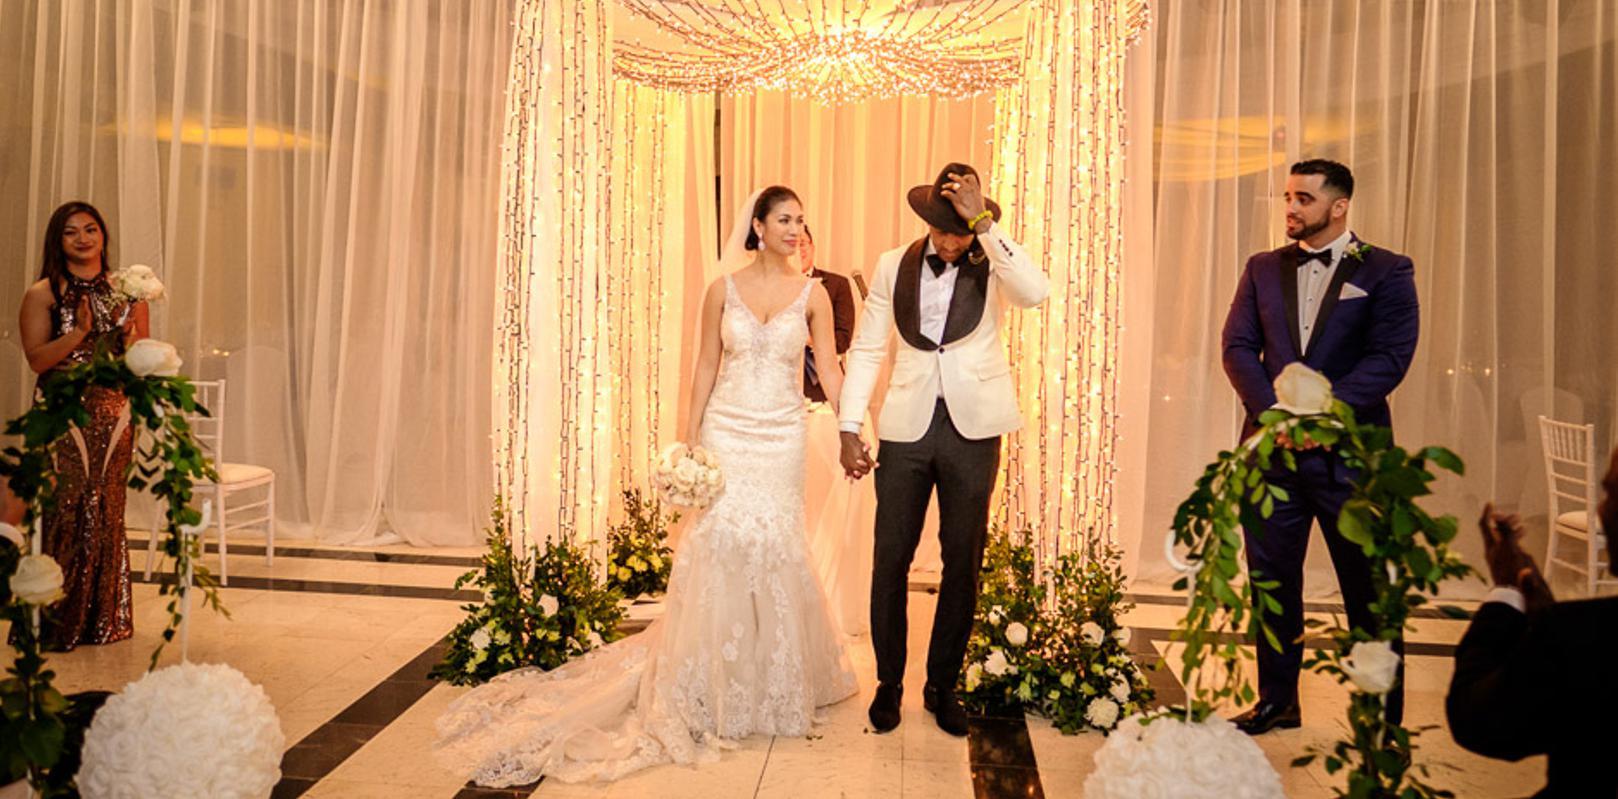 bodas-sin-clasificar-sin-tema-cuba-41411.jpg